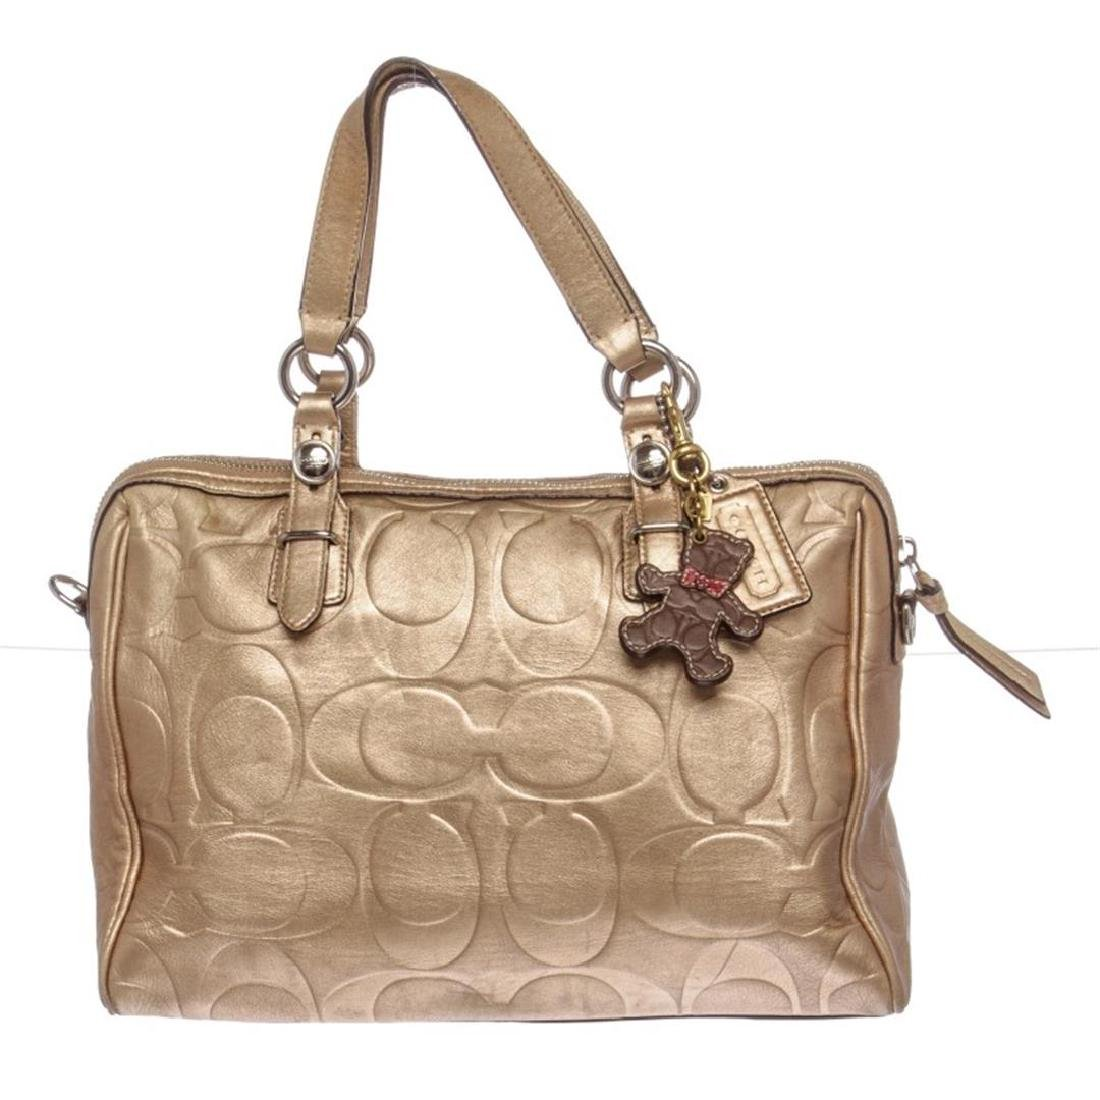 Coach Metallic Gold Monogram Leather Tote Bag